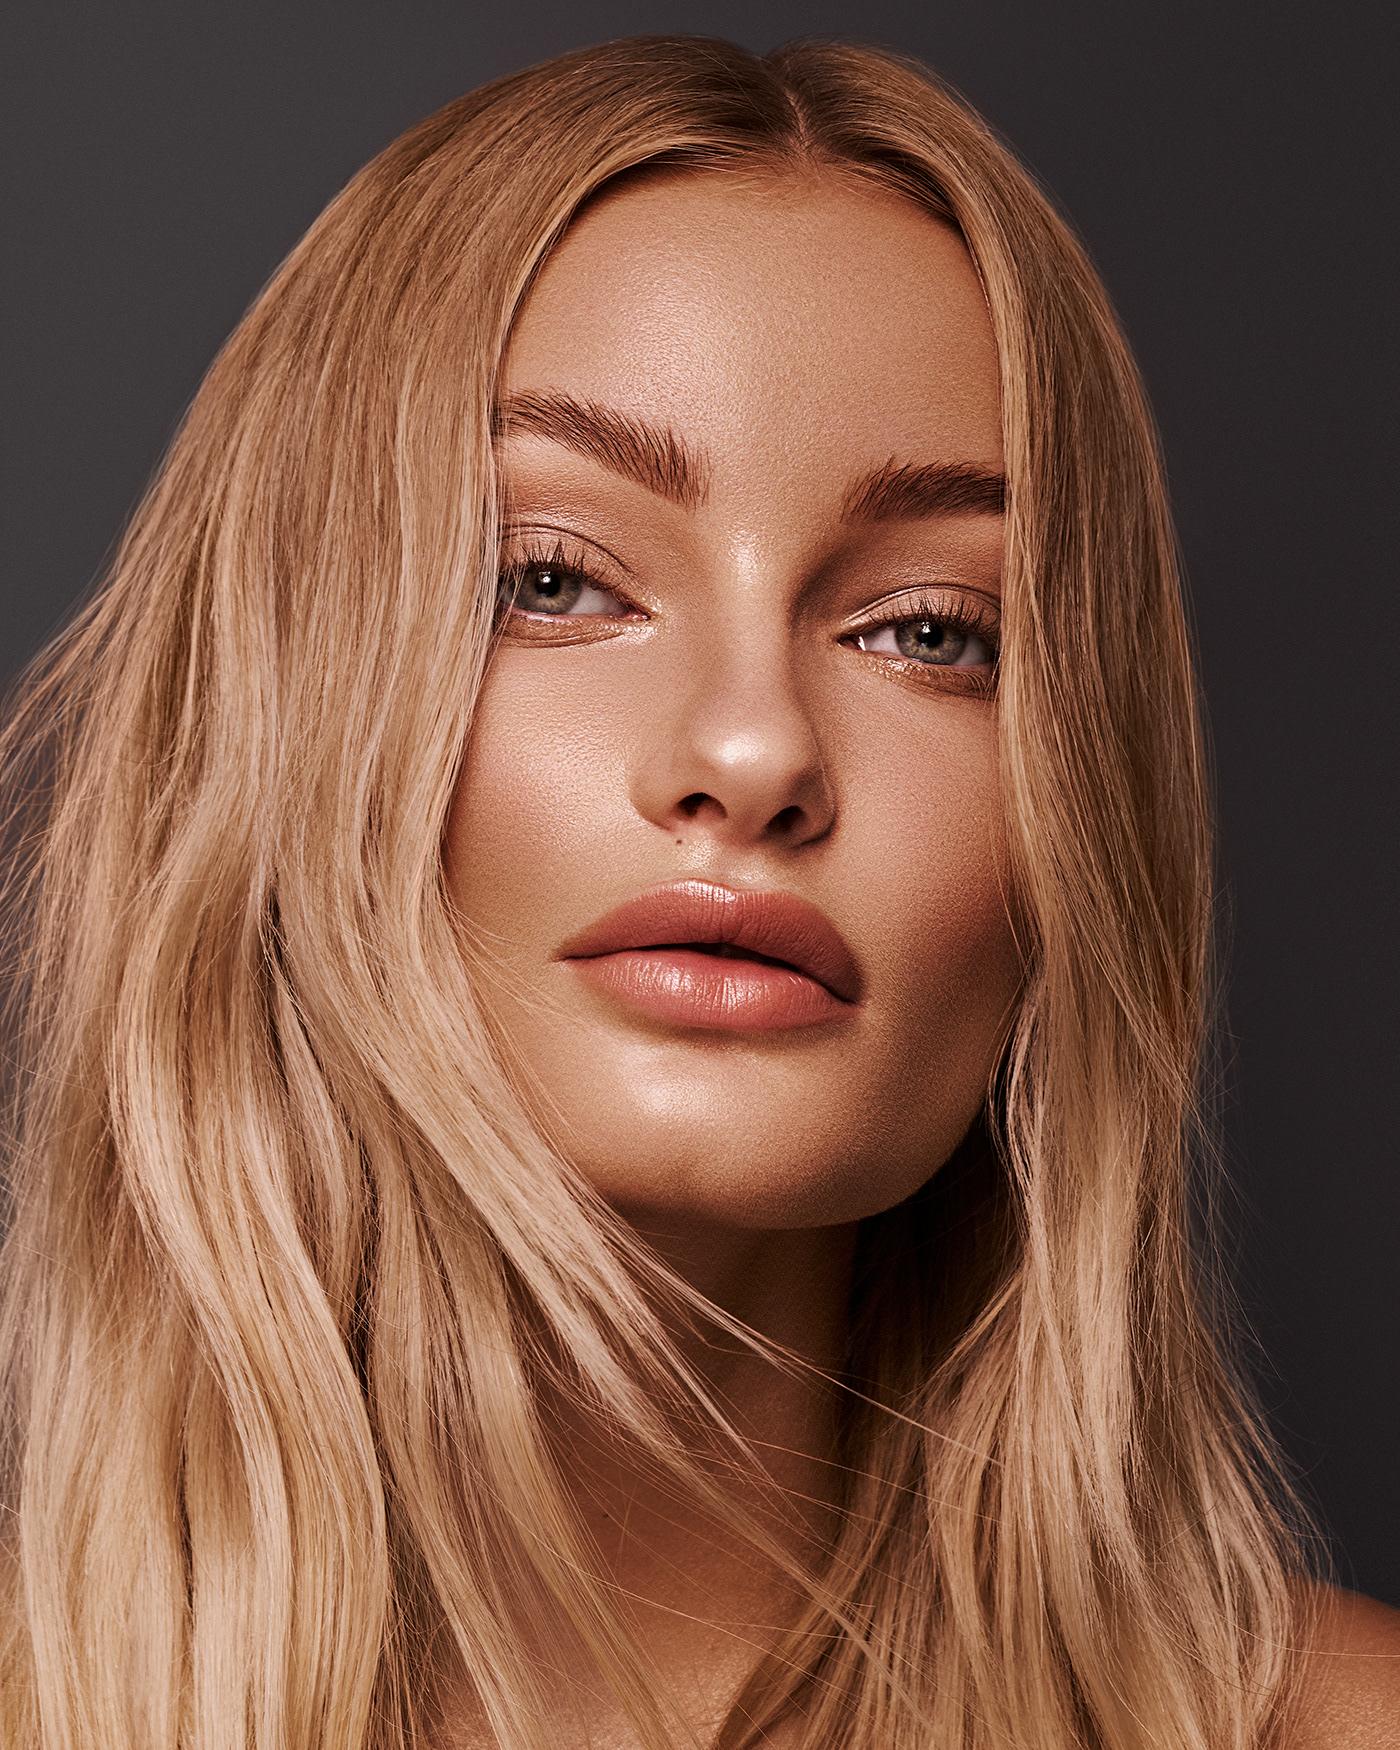 beauty beauty photography freckles London makeup retouching  skin studio